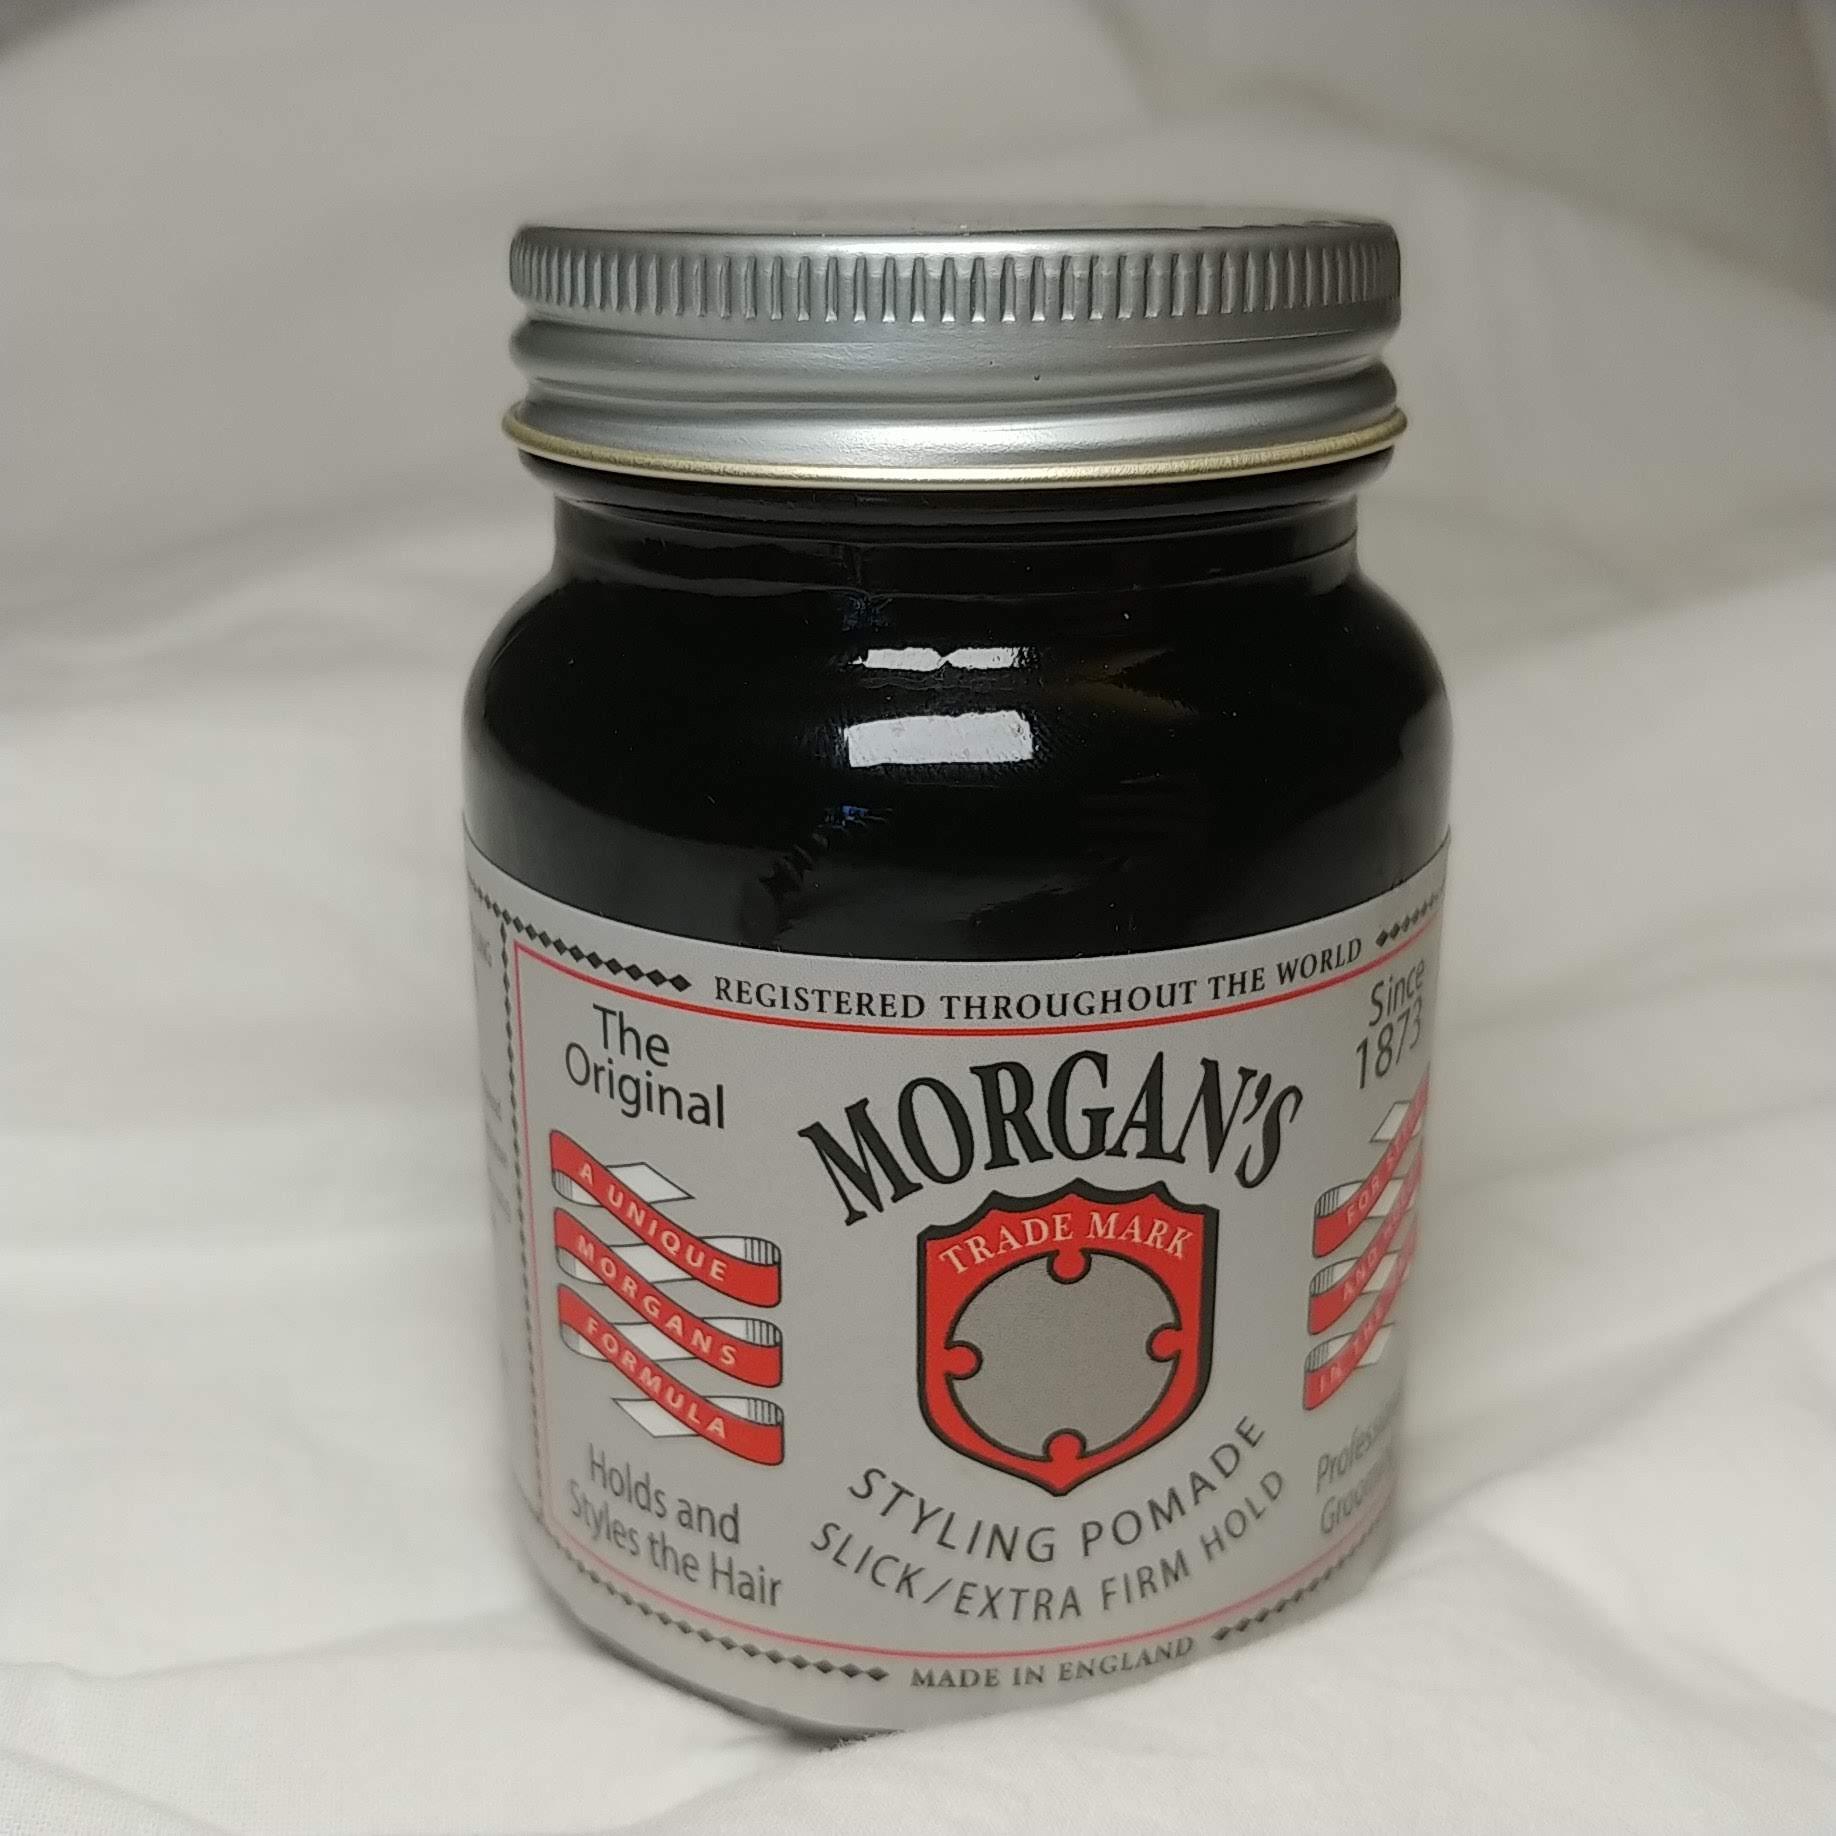 Morgan's Pomade